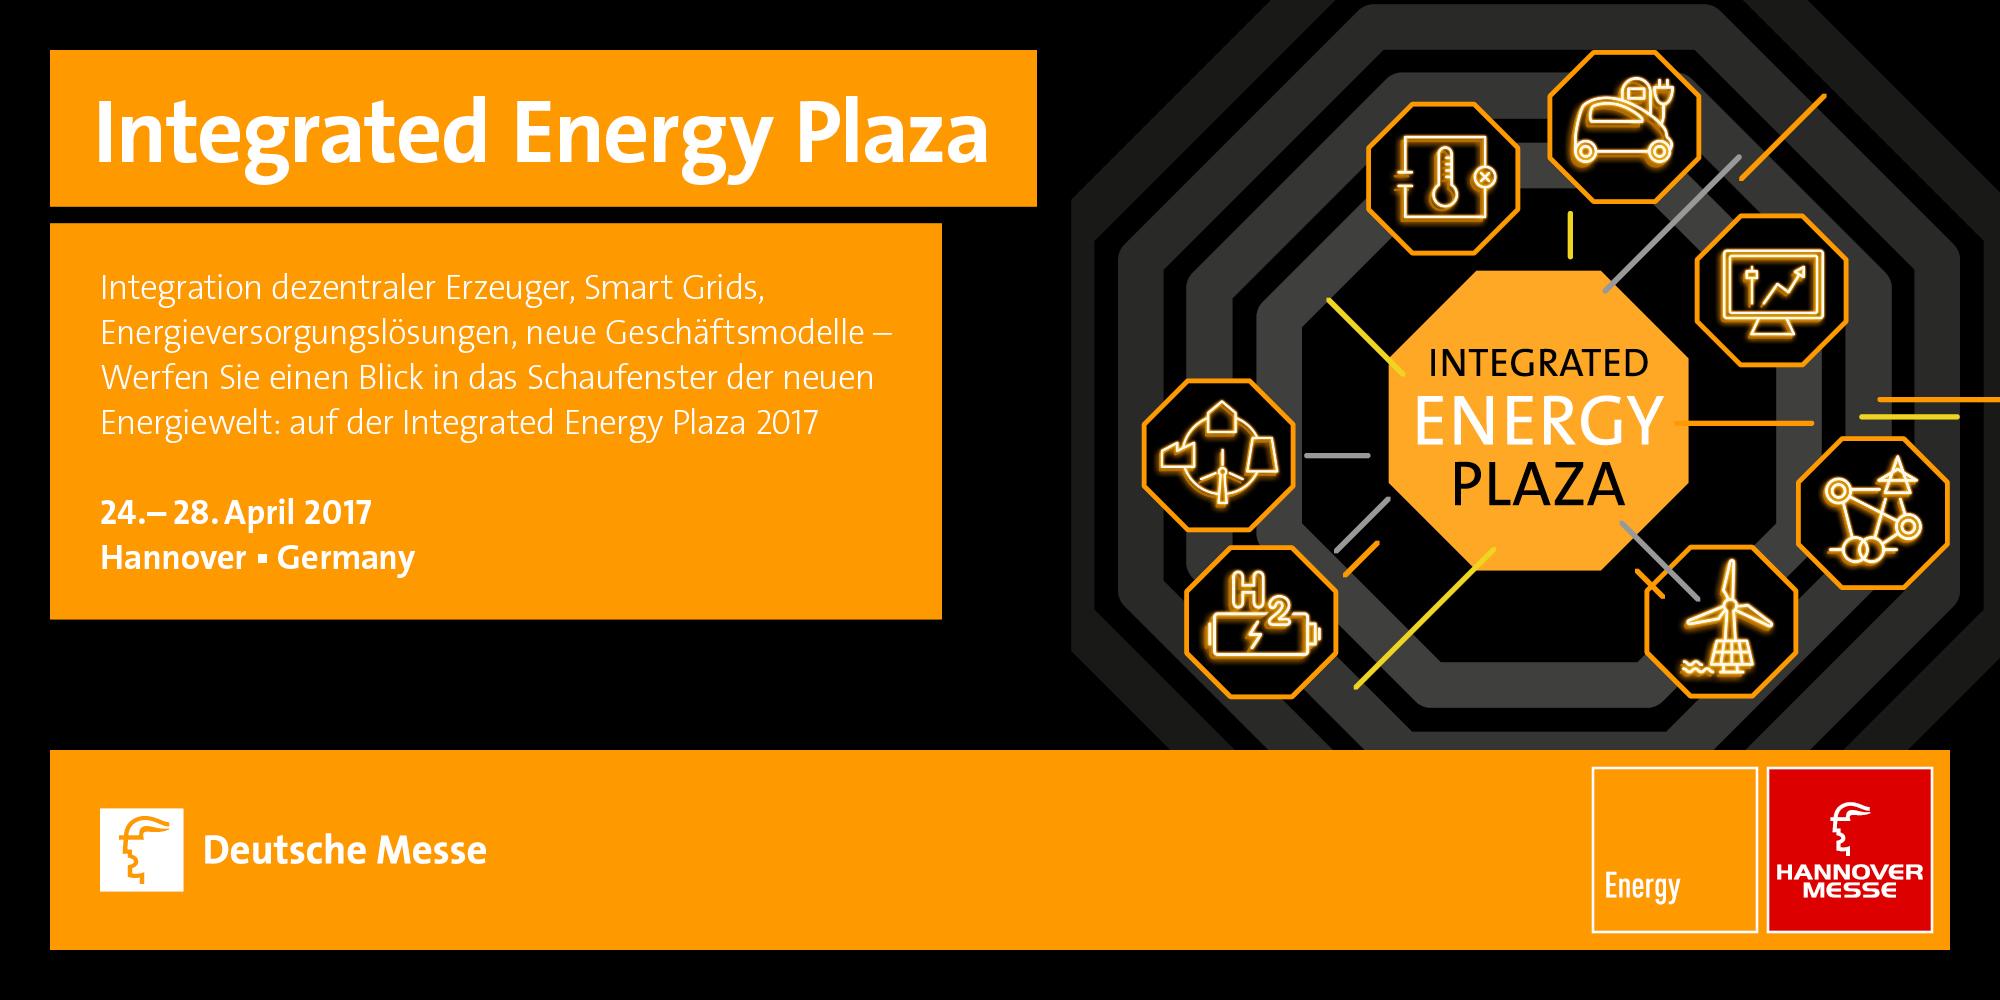 hannover messe 2017 integrated energy plaza und sonderschau digital energy deutsche energie. Black Bedroom Furniture Sets. Home Design Ideas